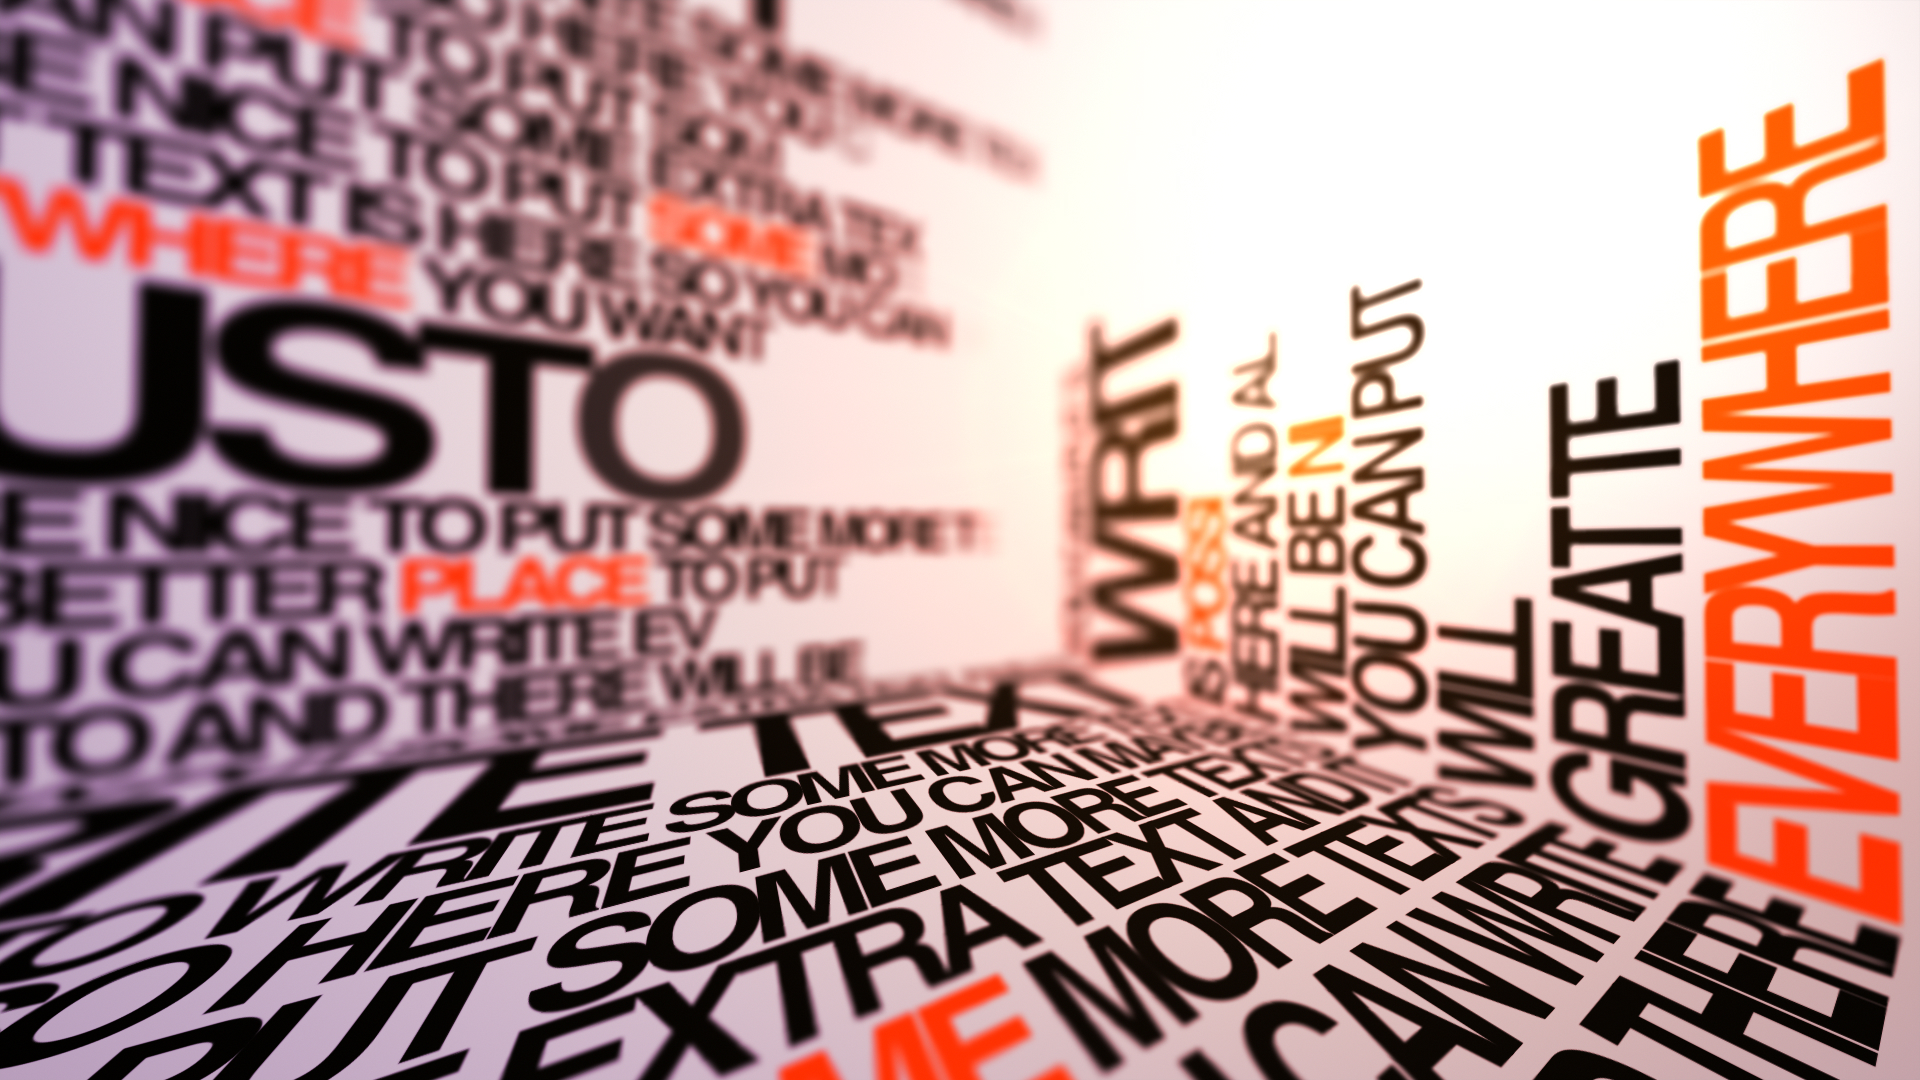 MART typography wallpaper v by Milenist on